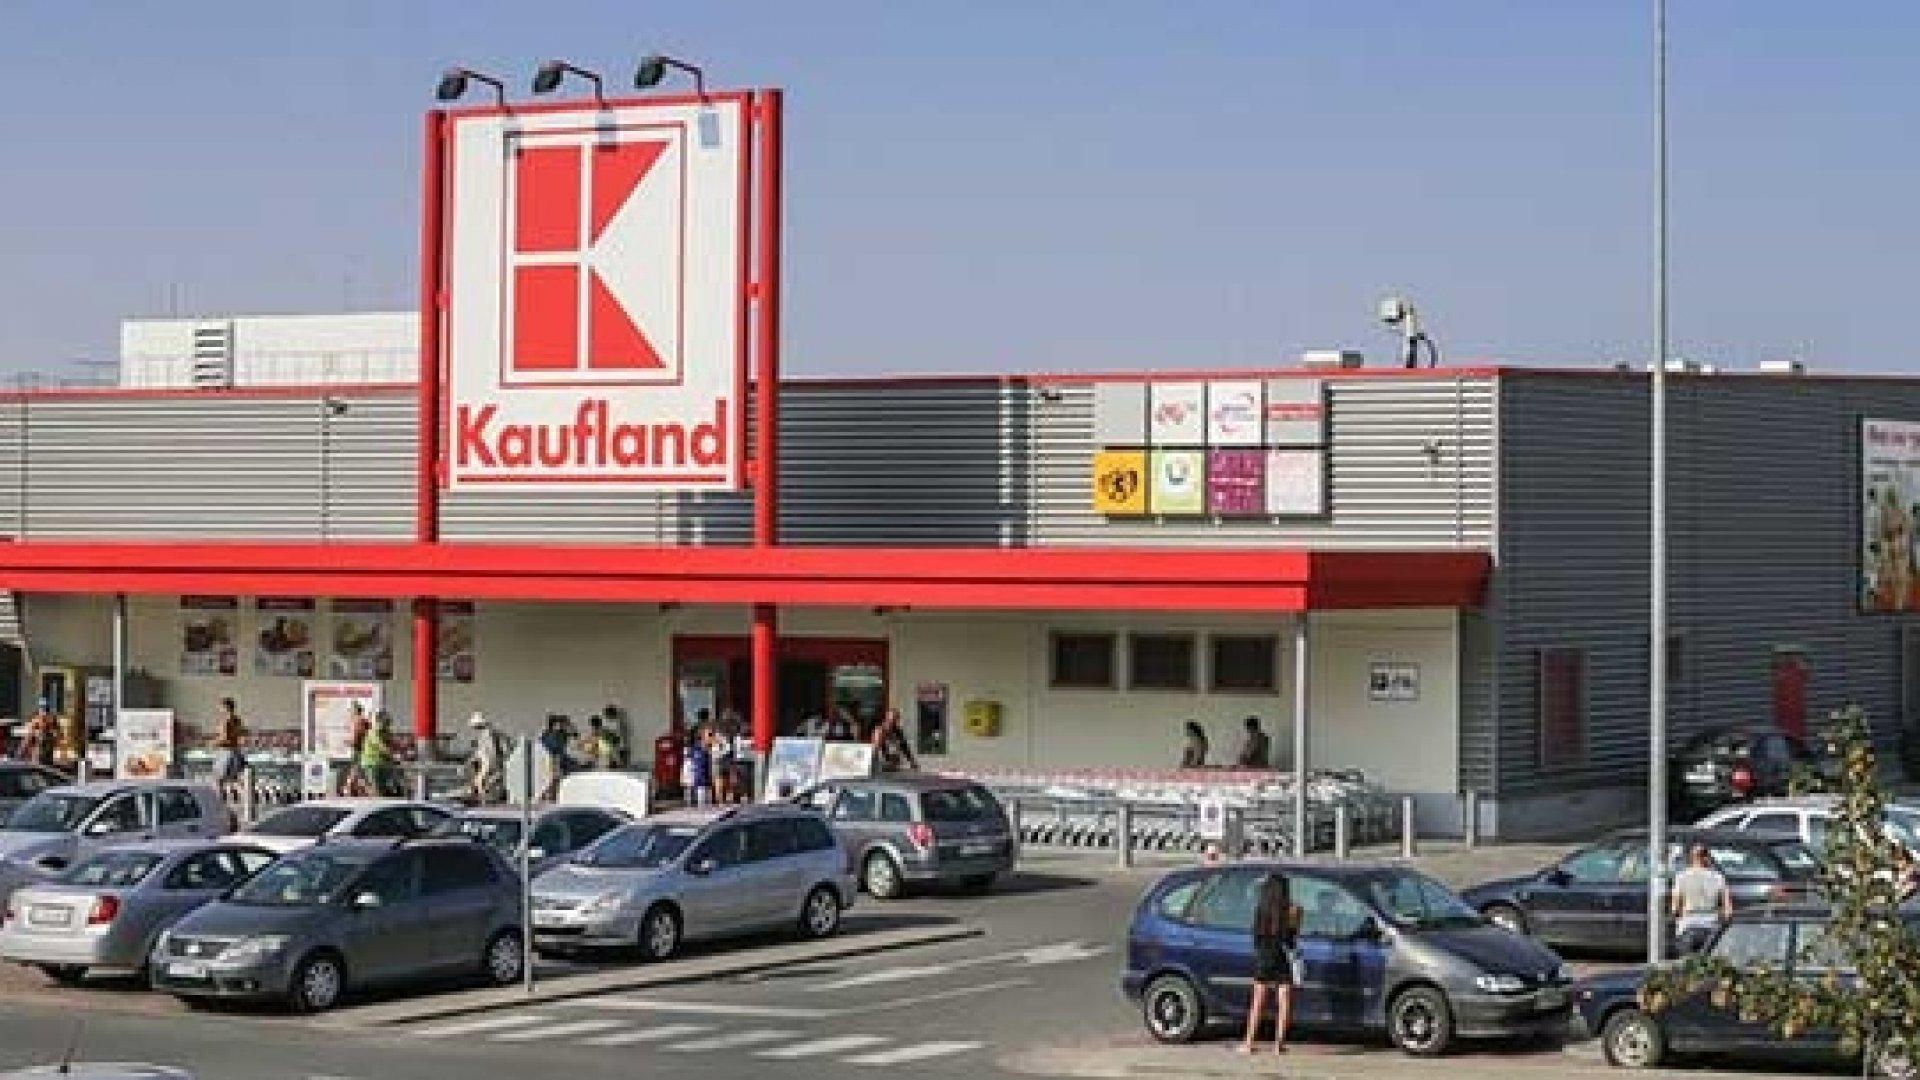 Haufland